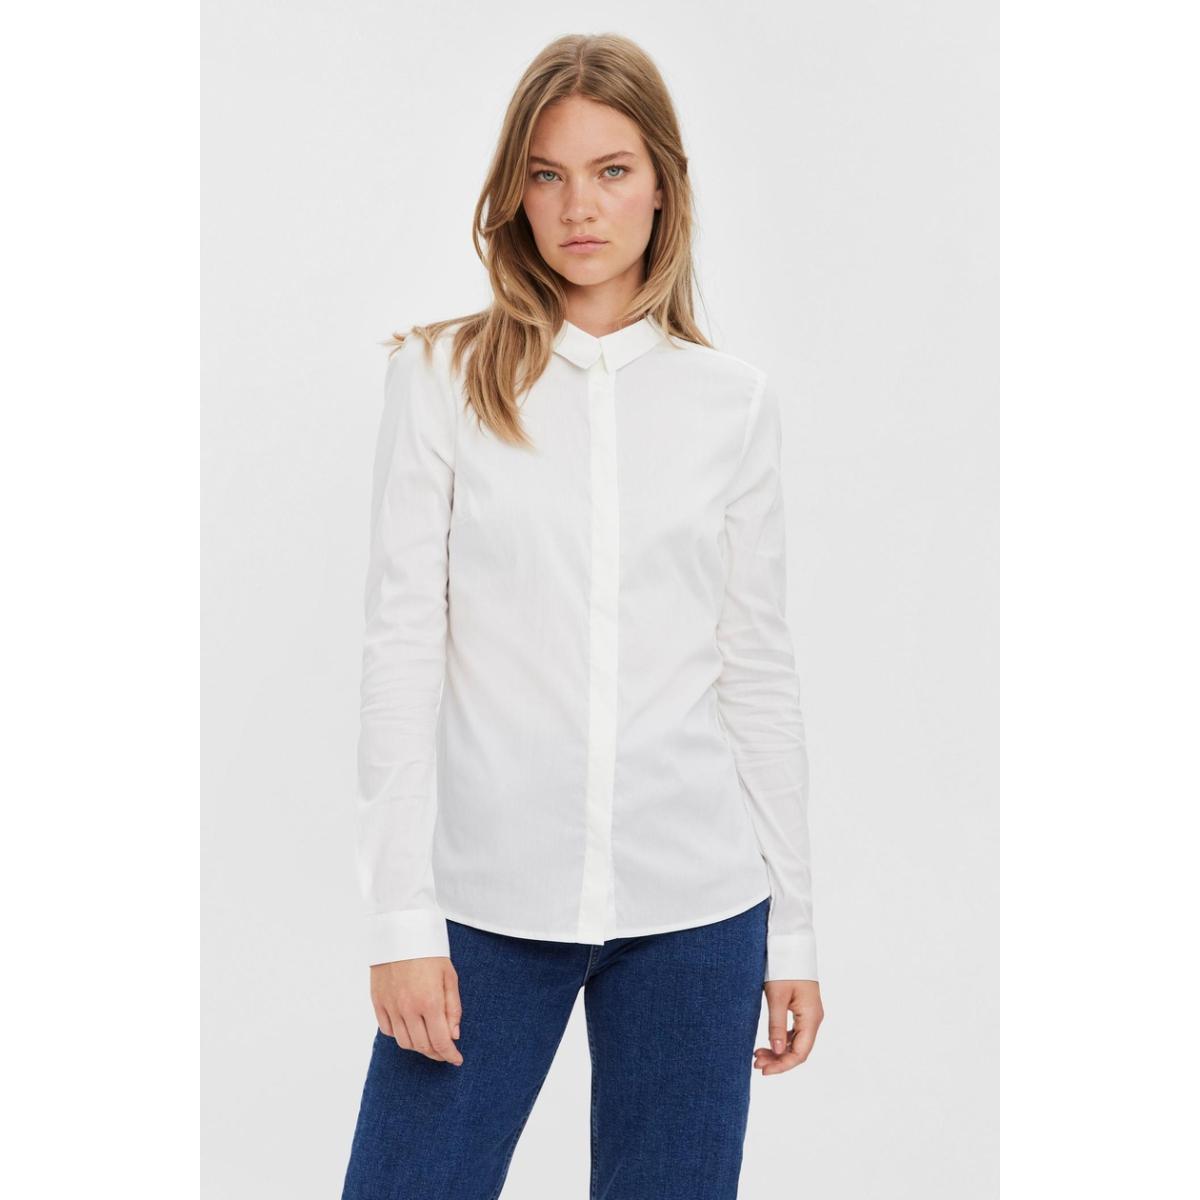 vmlady fine l/s shirt noos 10164900 vero moda blouse bright white